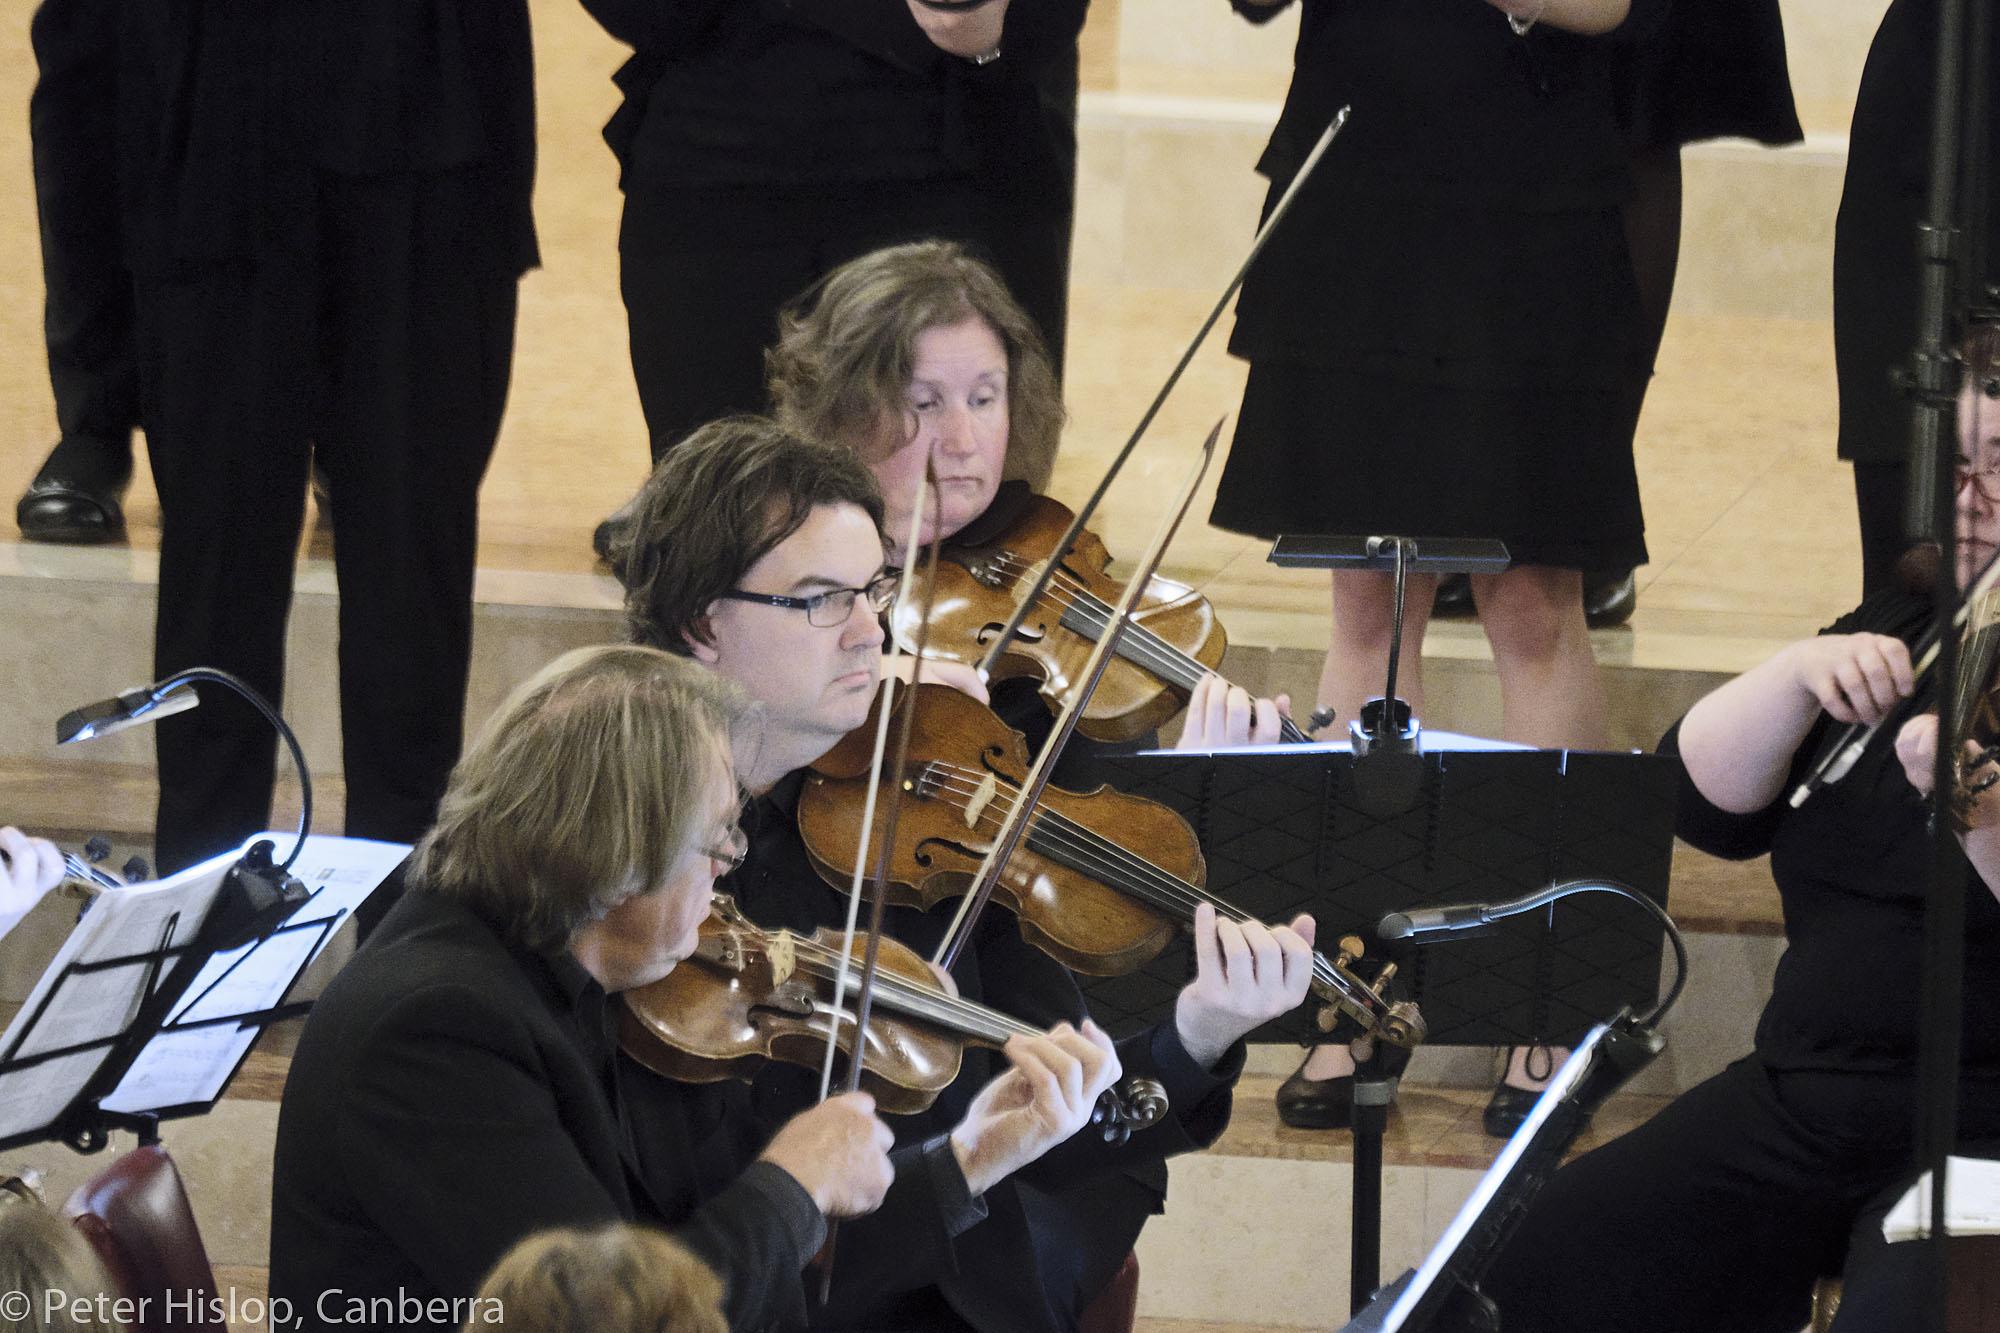 20181027c 006 Canberra Bach Ensemble - O